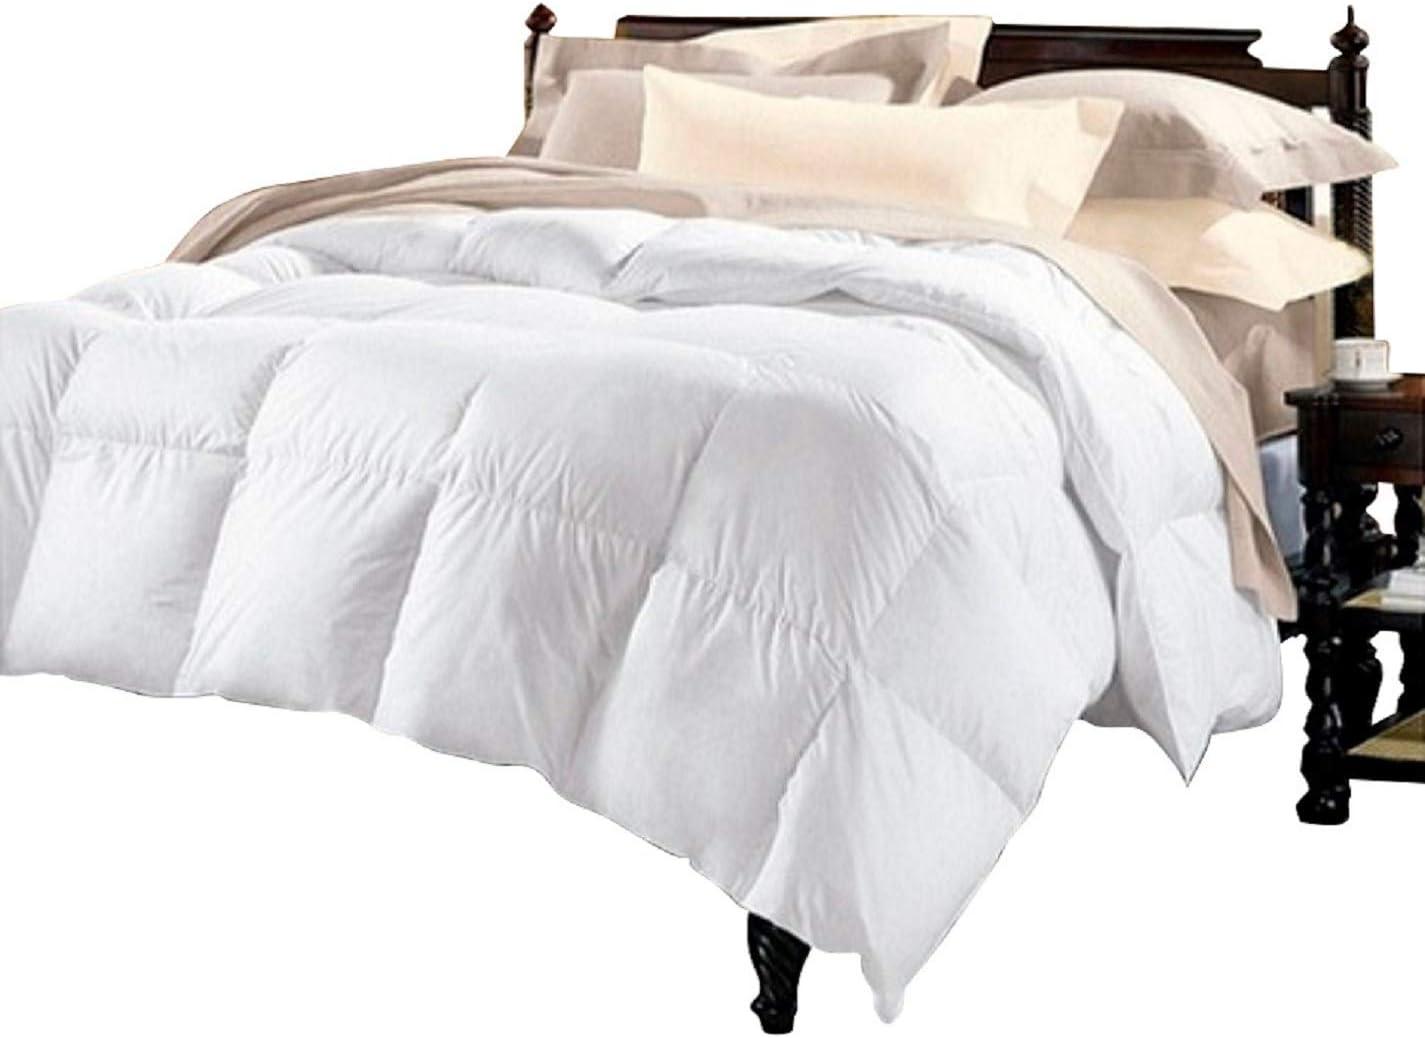 Home Sweet Home Dreams Wcomf Q Duvet Comforter Full Queen White Home Kitchen Amazon Com